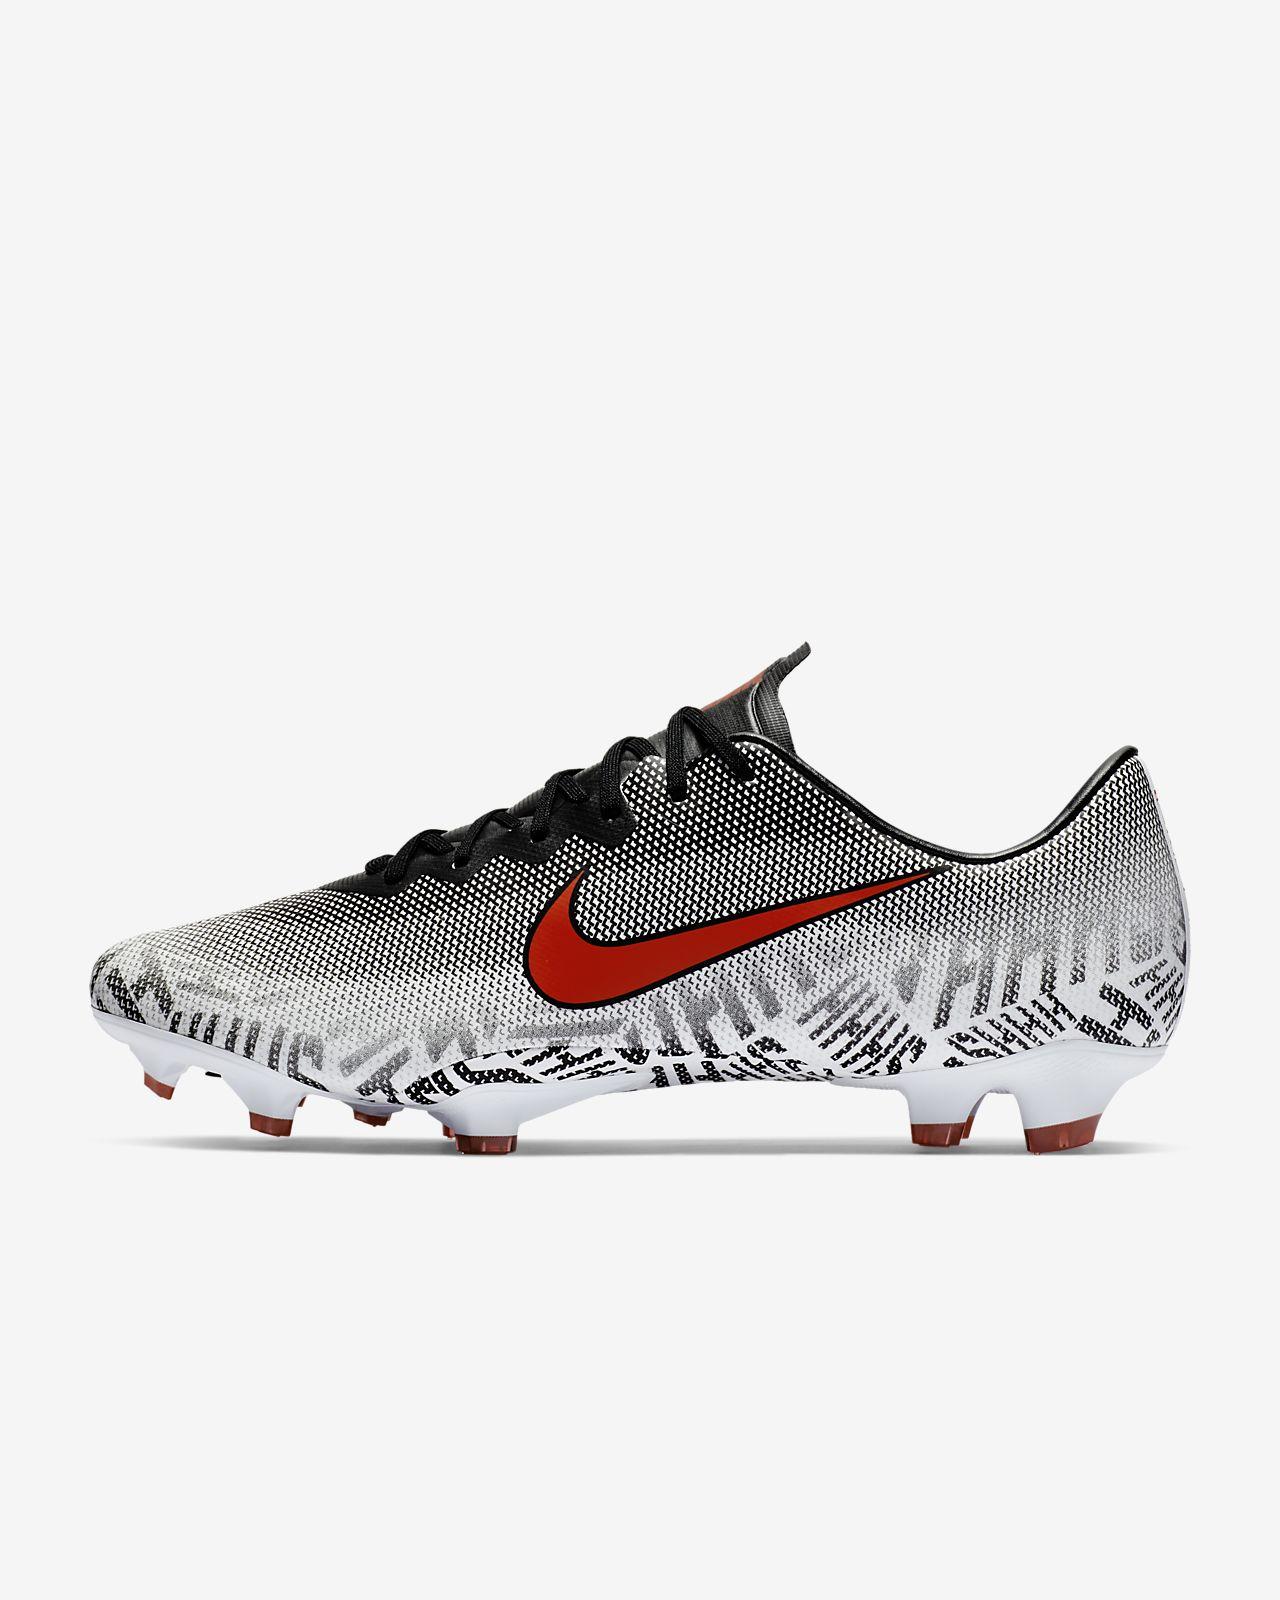 best cheap f5379 dbc26 ... Nike Mercurial Vapor XII Pro Neymar Jr Botas de fútbol para terreno  firme - Hombre